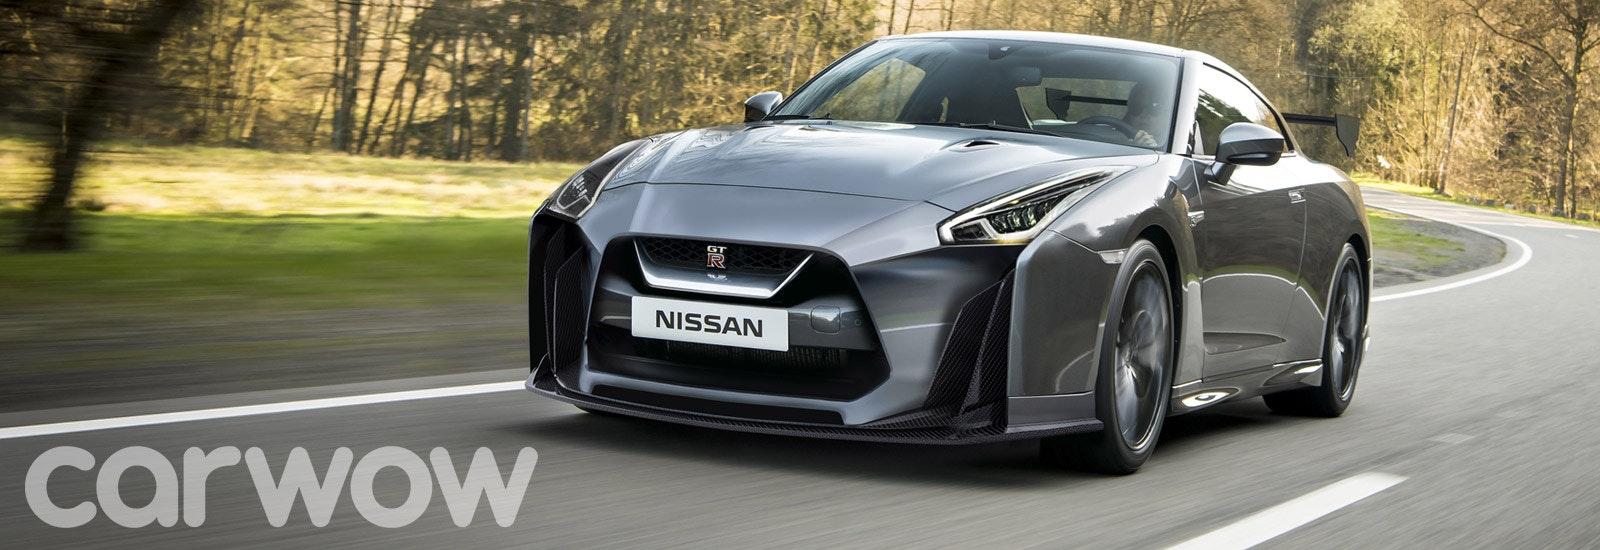 Nissan GT R R36 Styling